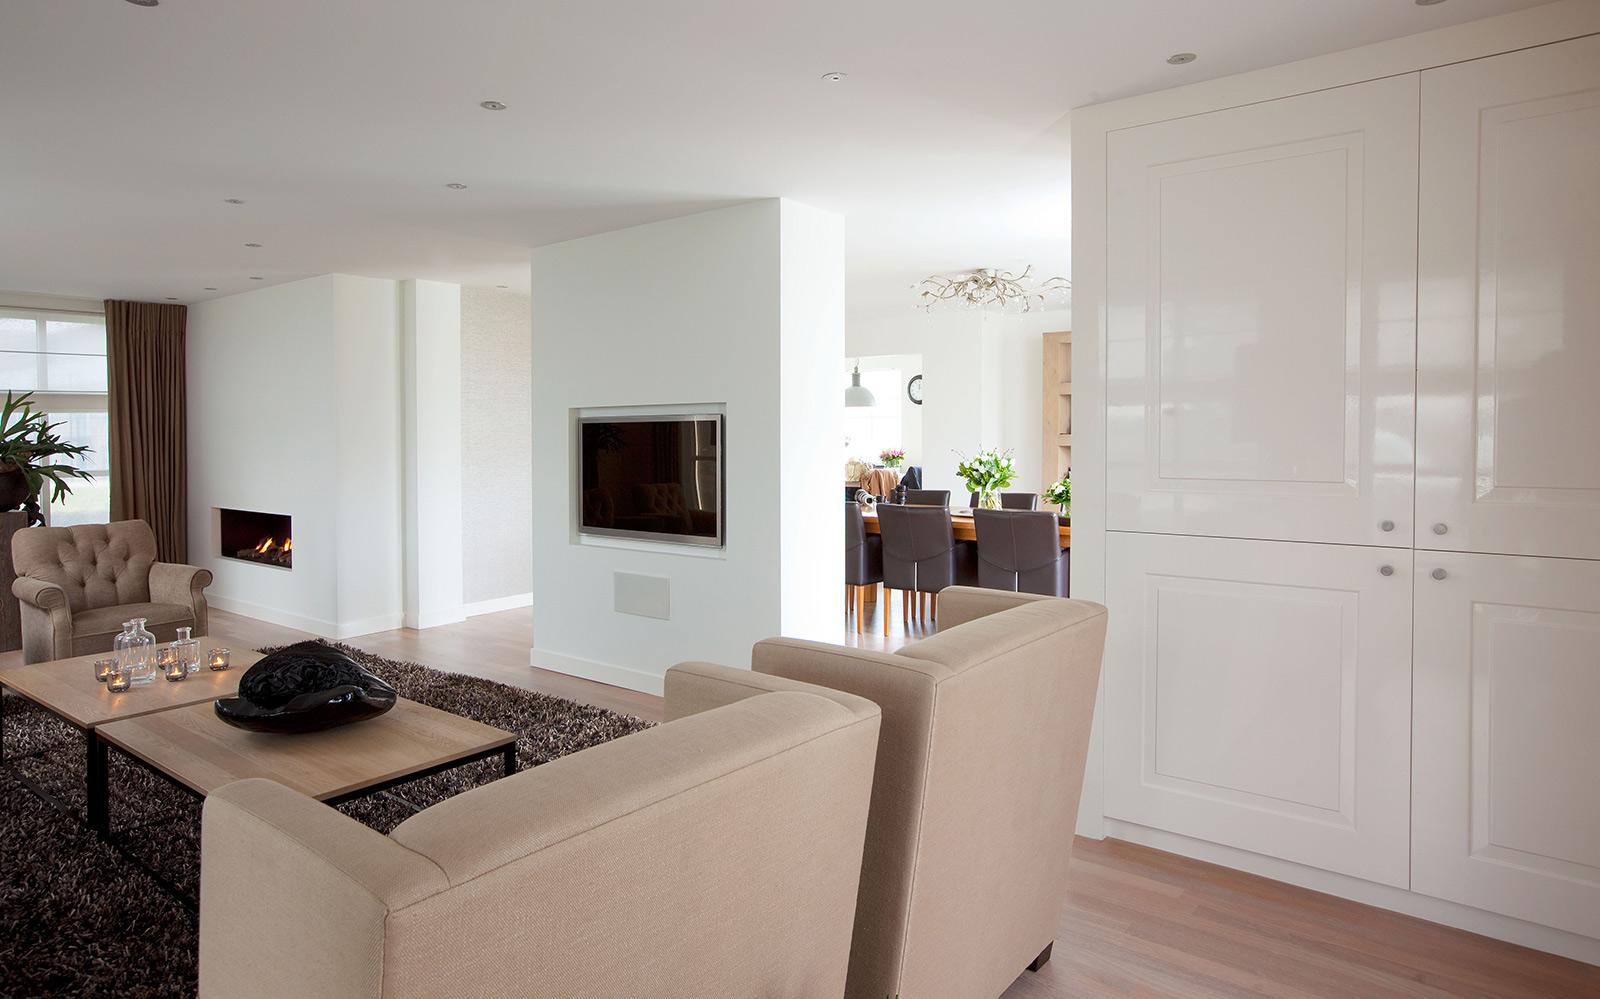 Een Klassiek Interieur : Modern klassiek interieur in het woonhuis the art of living nl